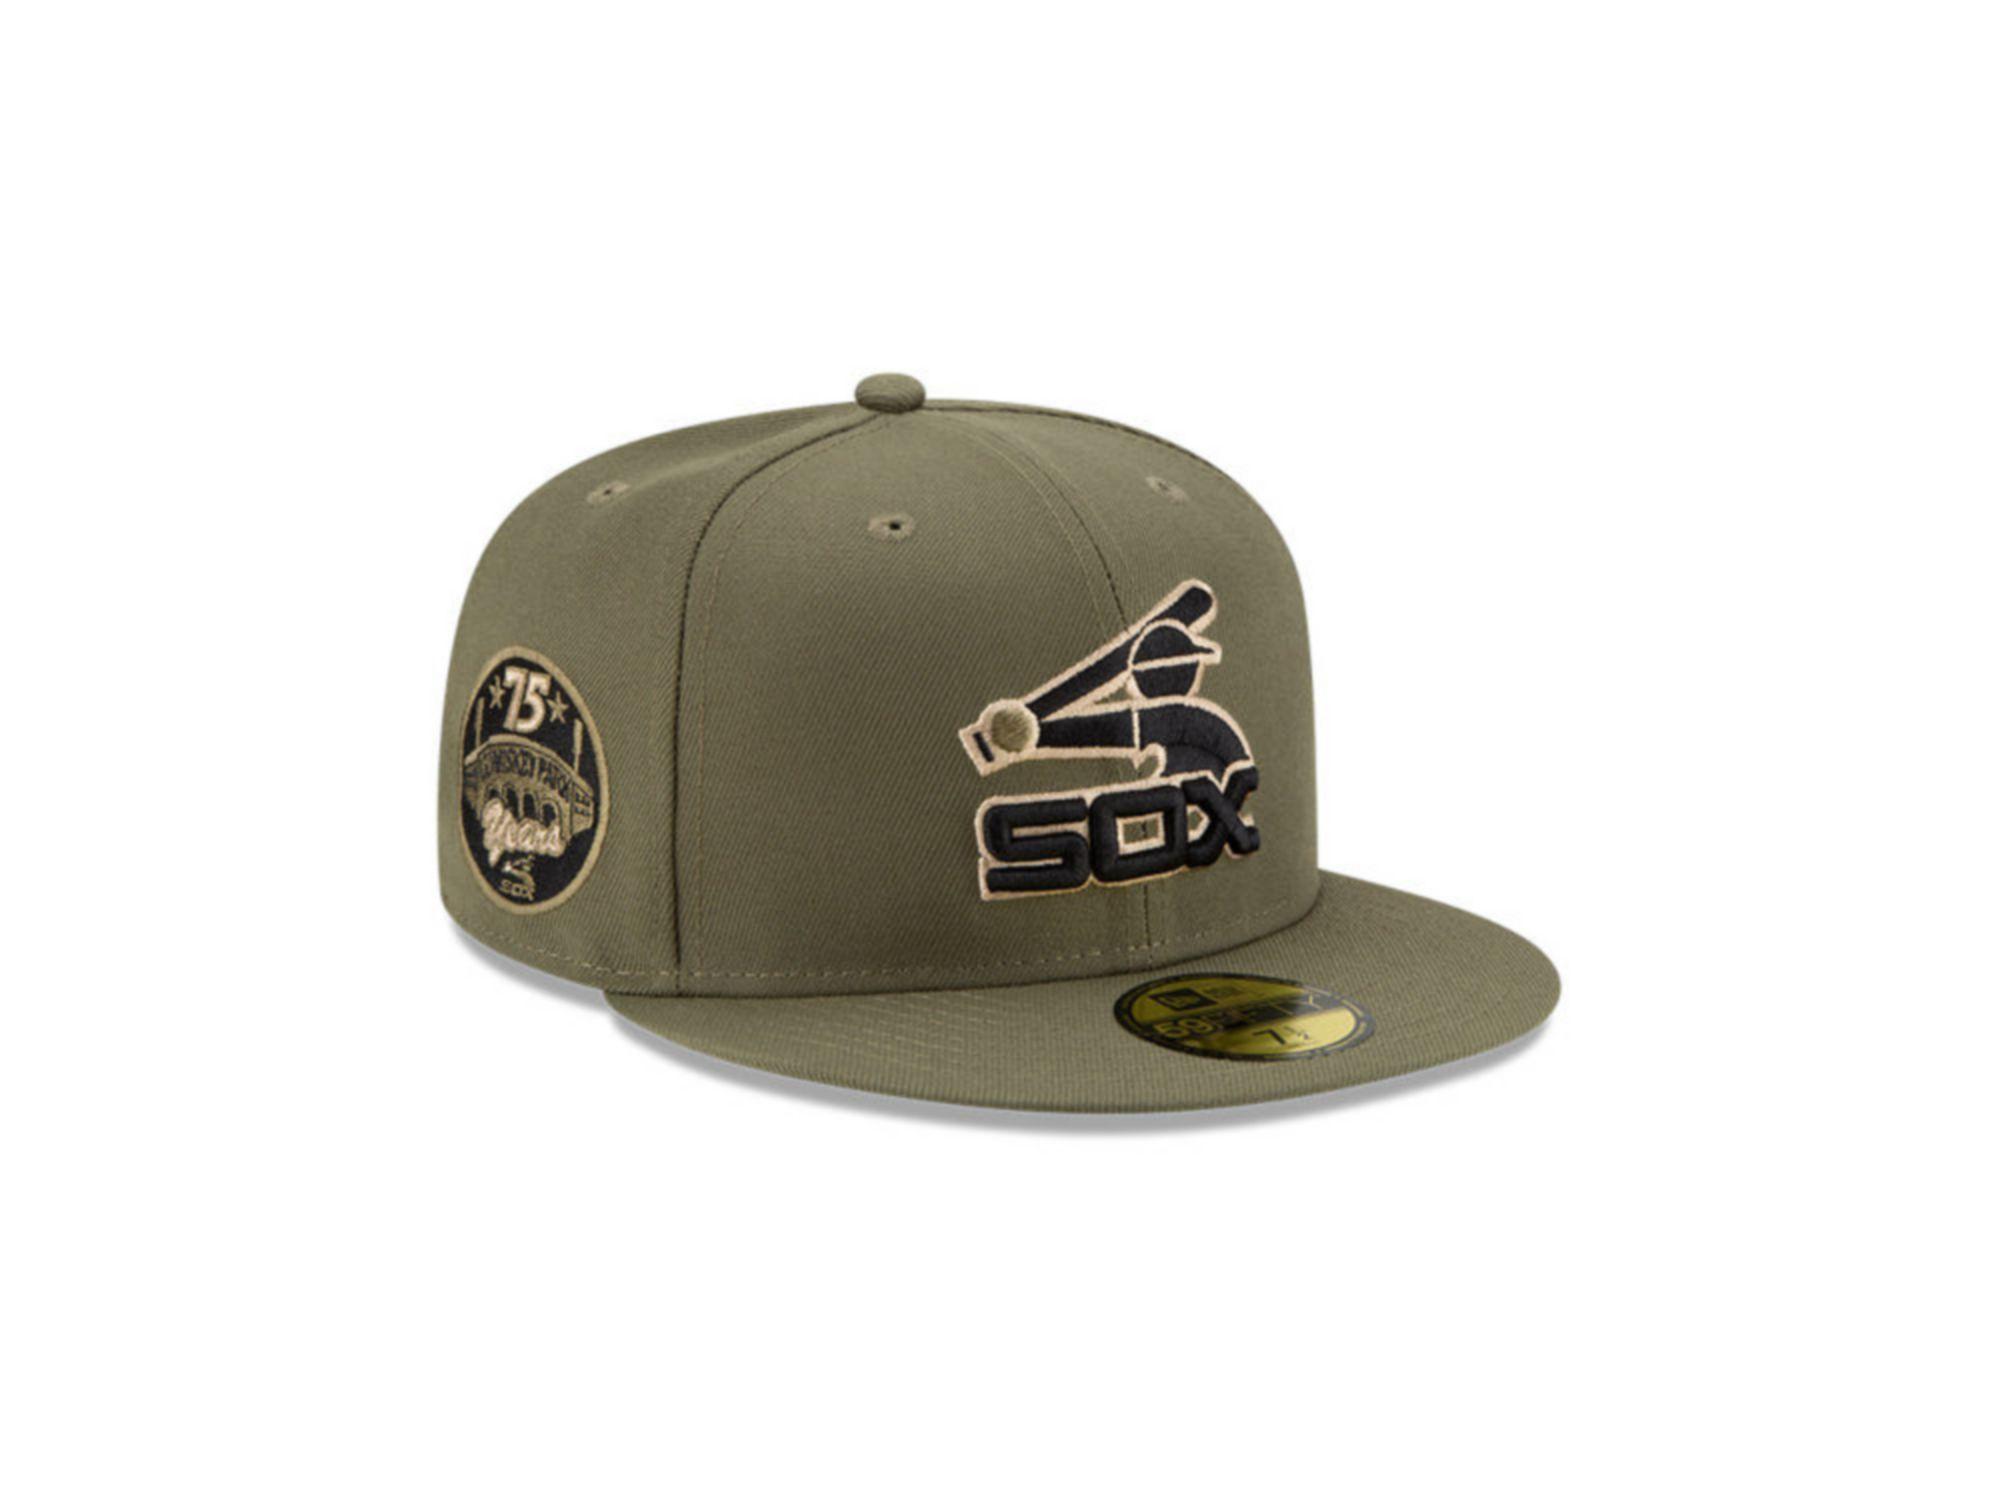 New Era Chicago White Sox Color UV 59FIFTY Cap & Reviews - MLB - Sports Fan Shop - Macy's